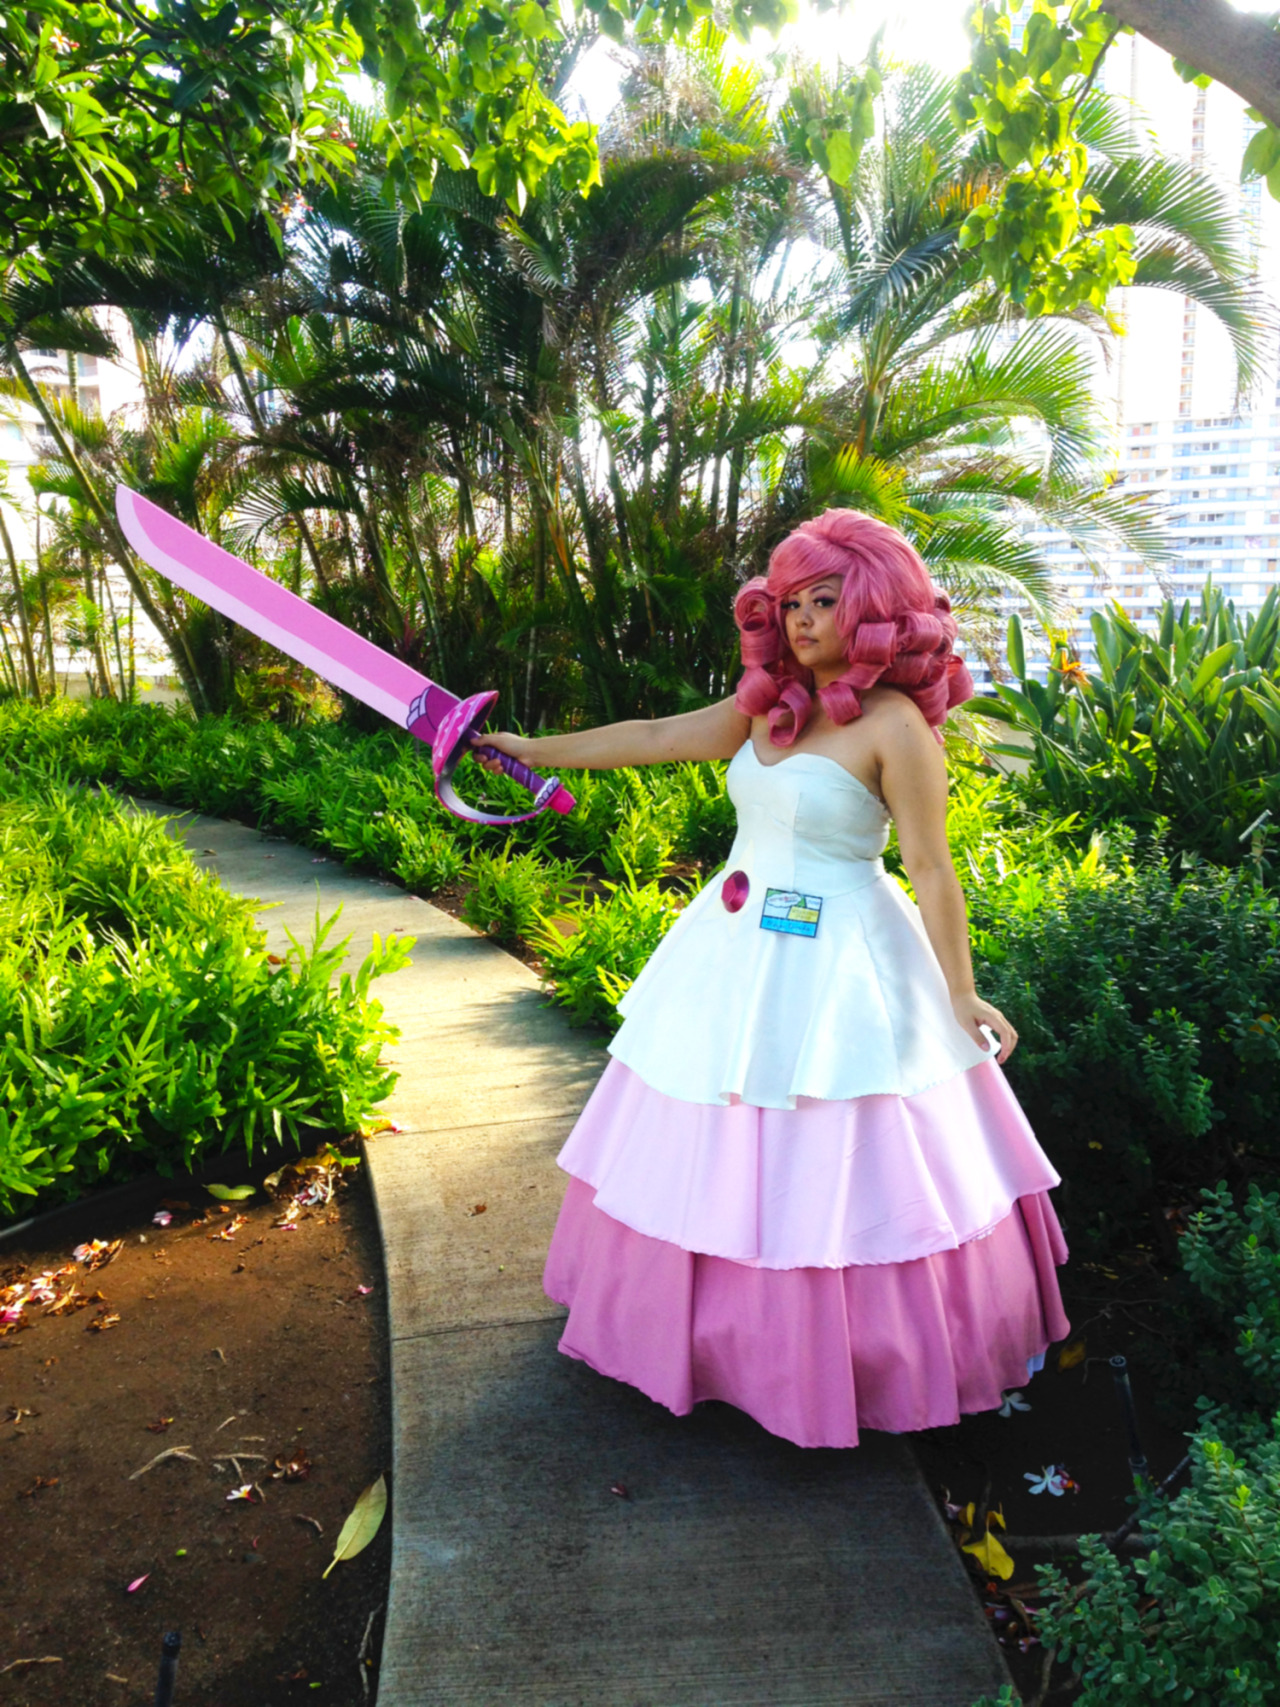 Mizimel as Rose Quartz from Steven Universe